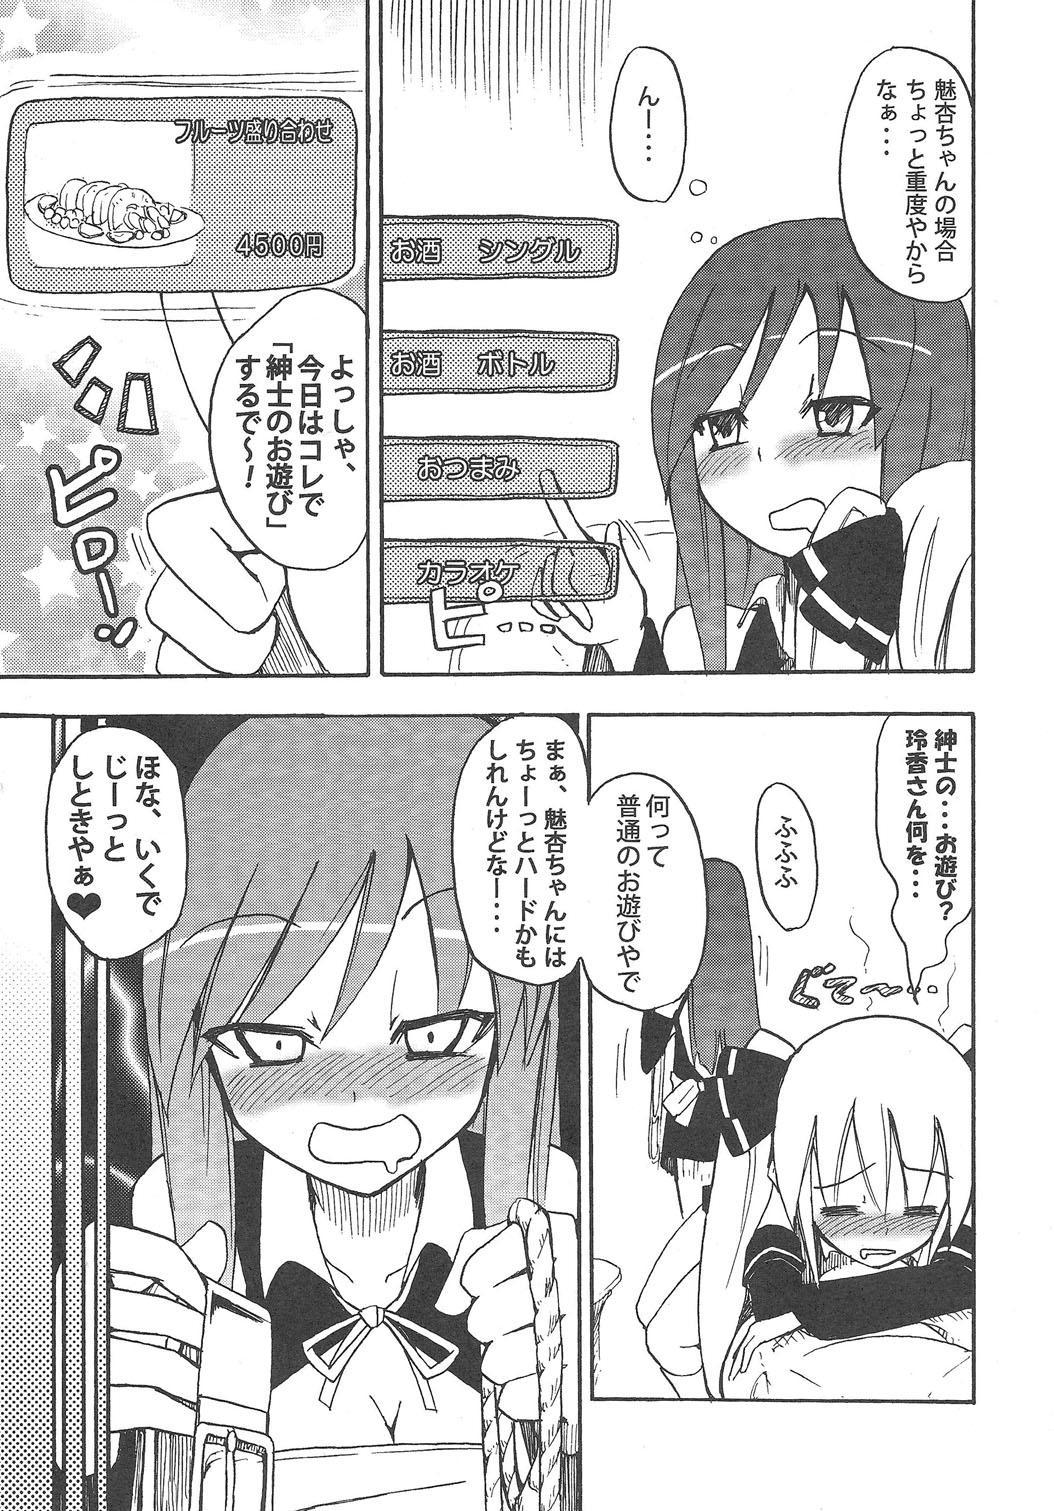 Homuraya Milk ★ Collection 61